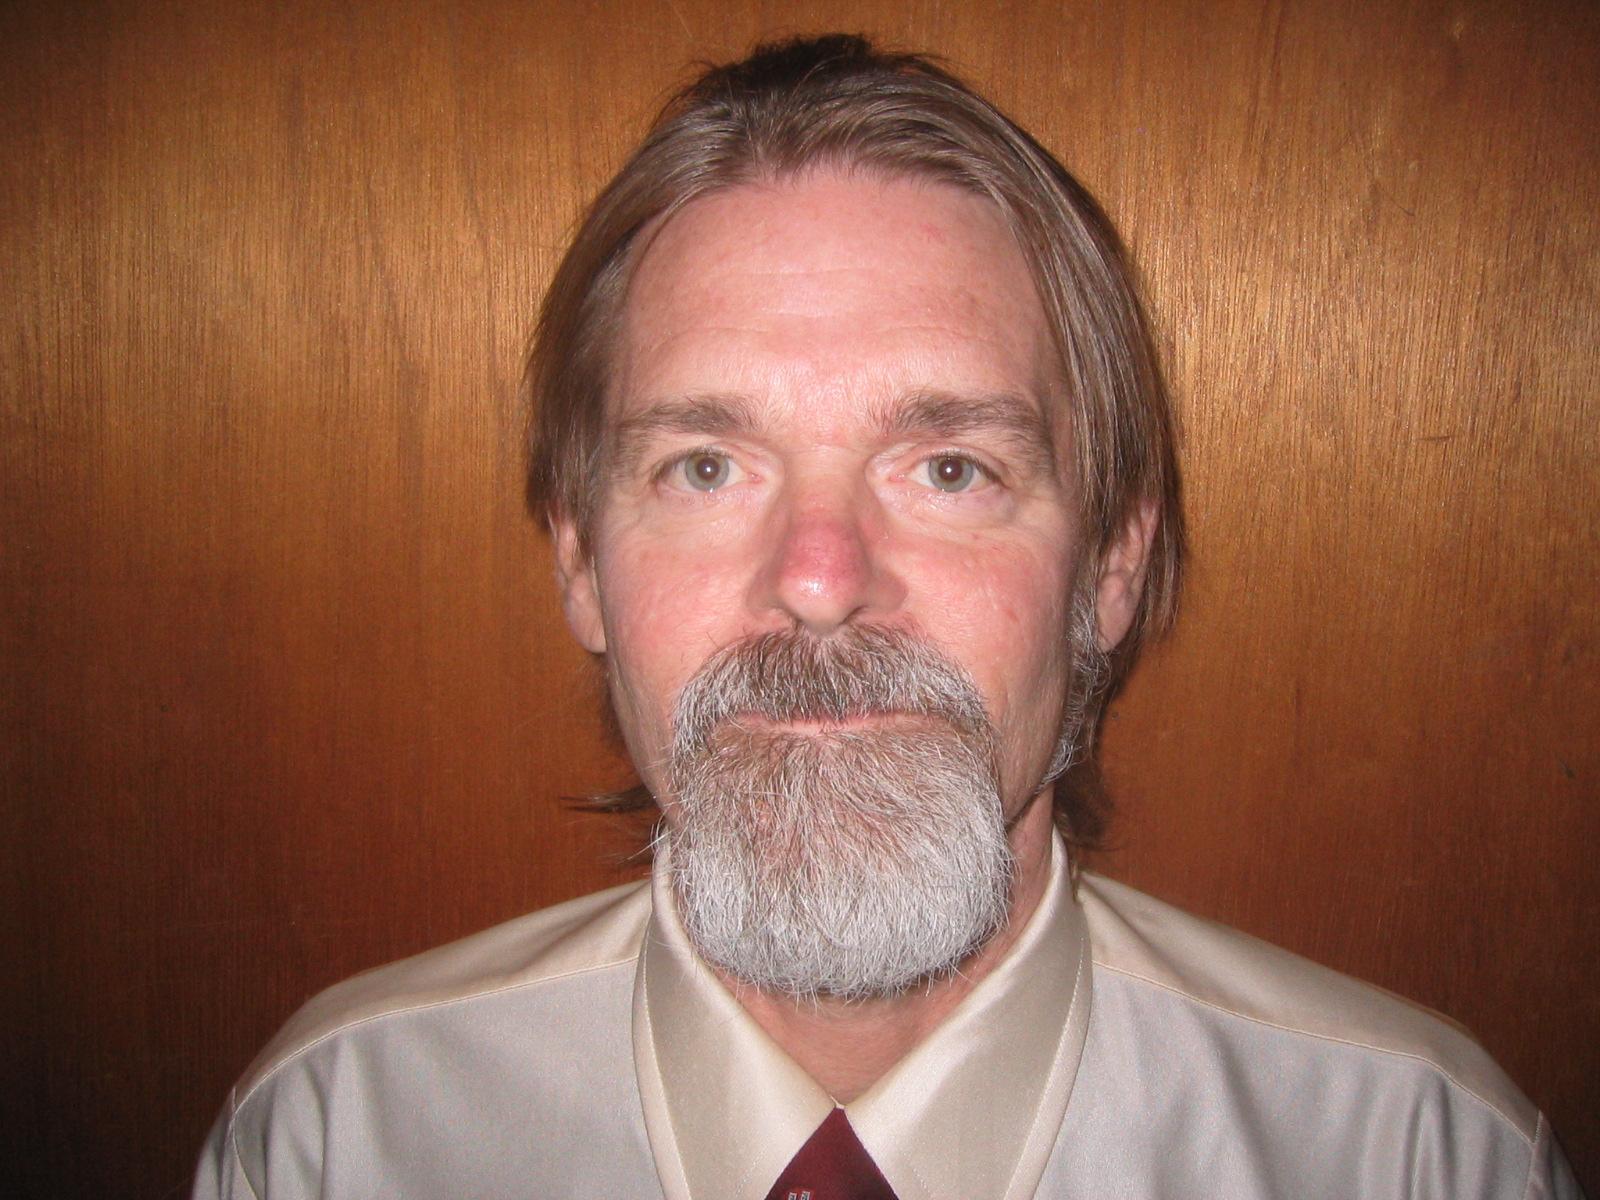 Legislators Seek Cal NORML's Approval